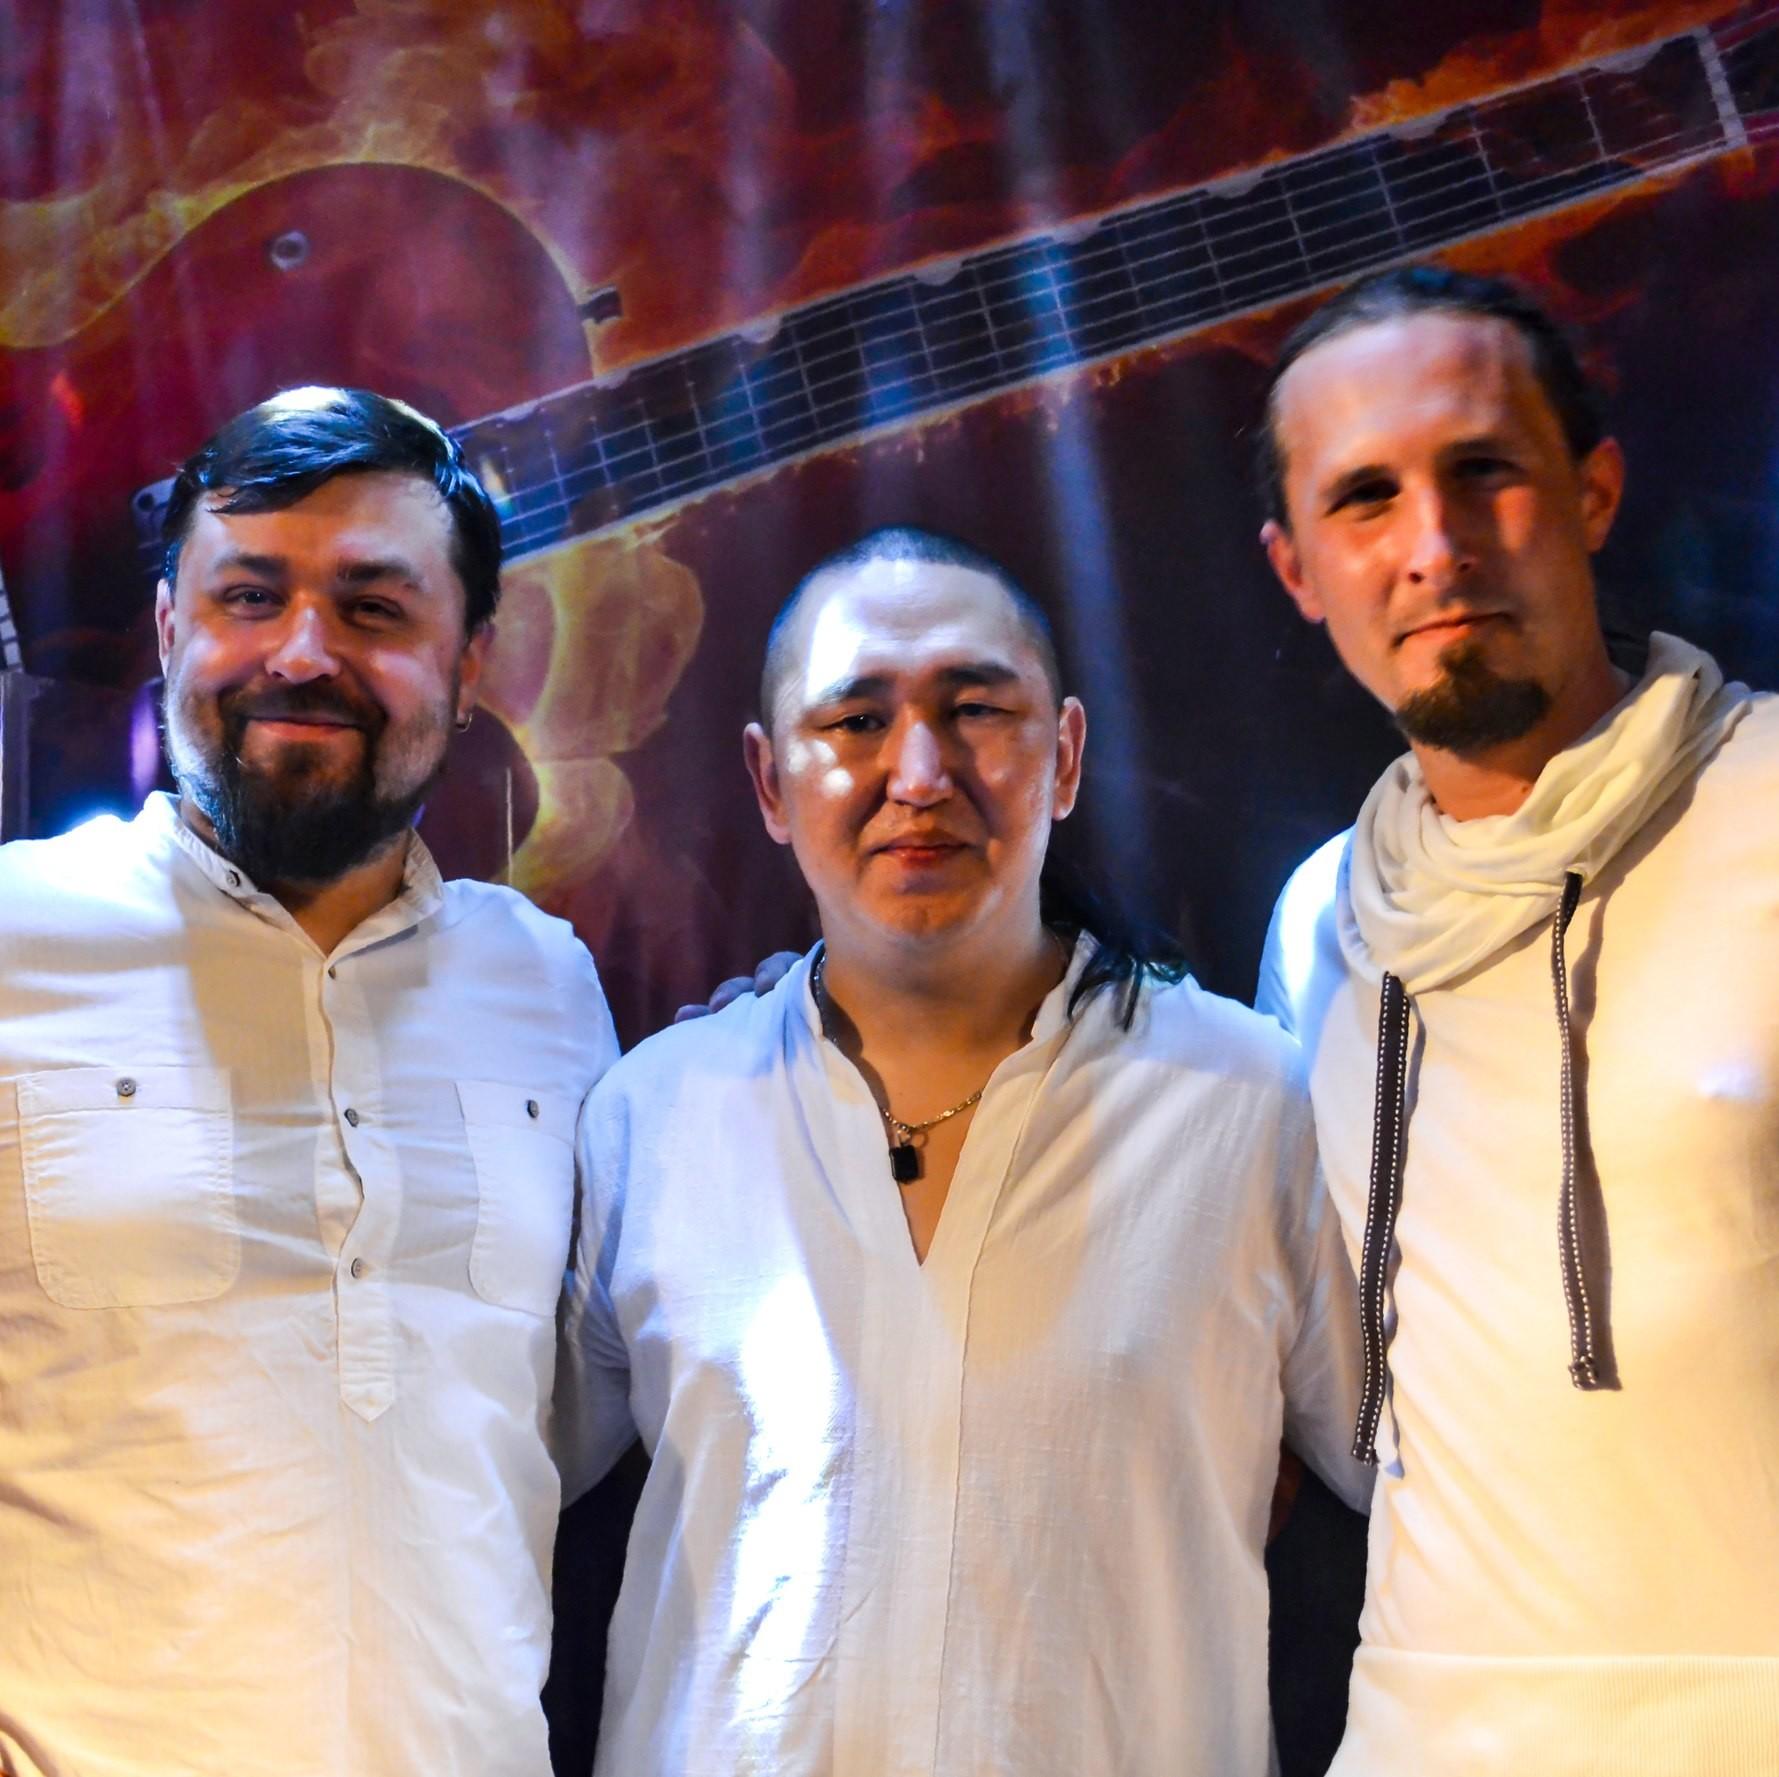 Белуха Джем / Belukha Jam (Горный Алтай)